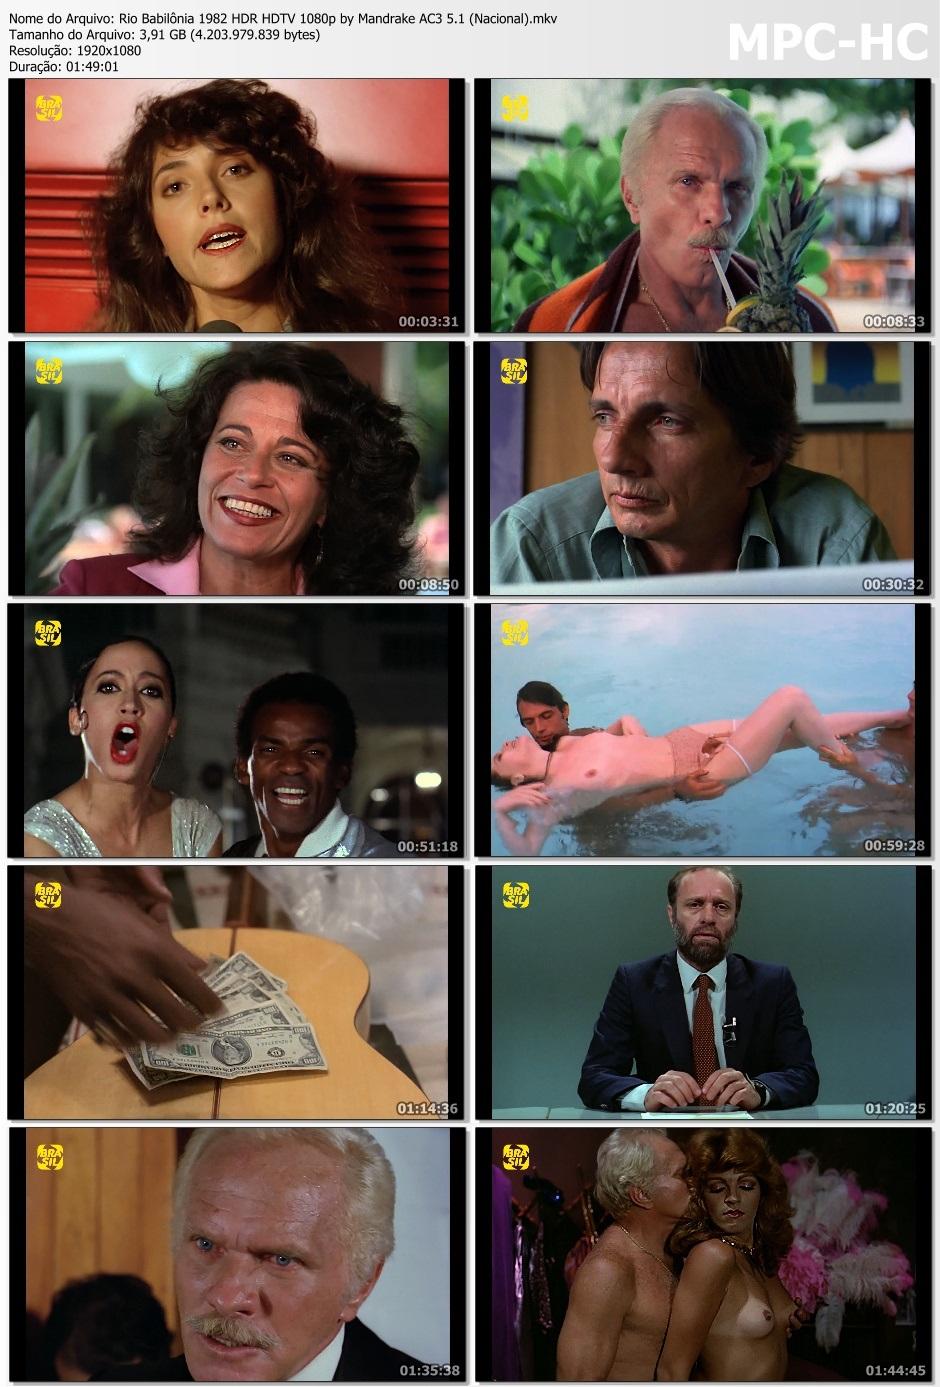 RIO BABILÔNIA (HDTV/1080P/NACIONAL) - 1982 Rio%2B00